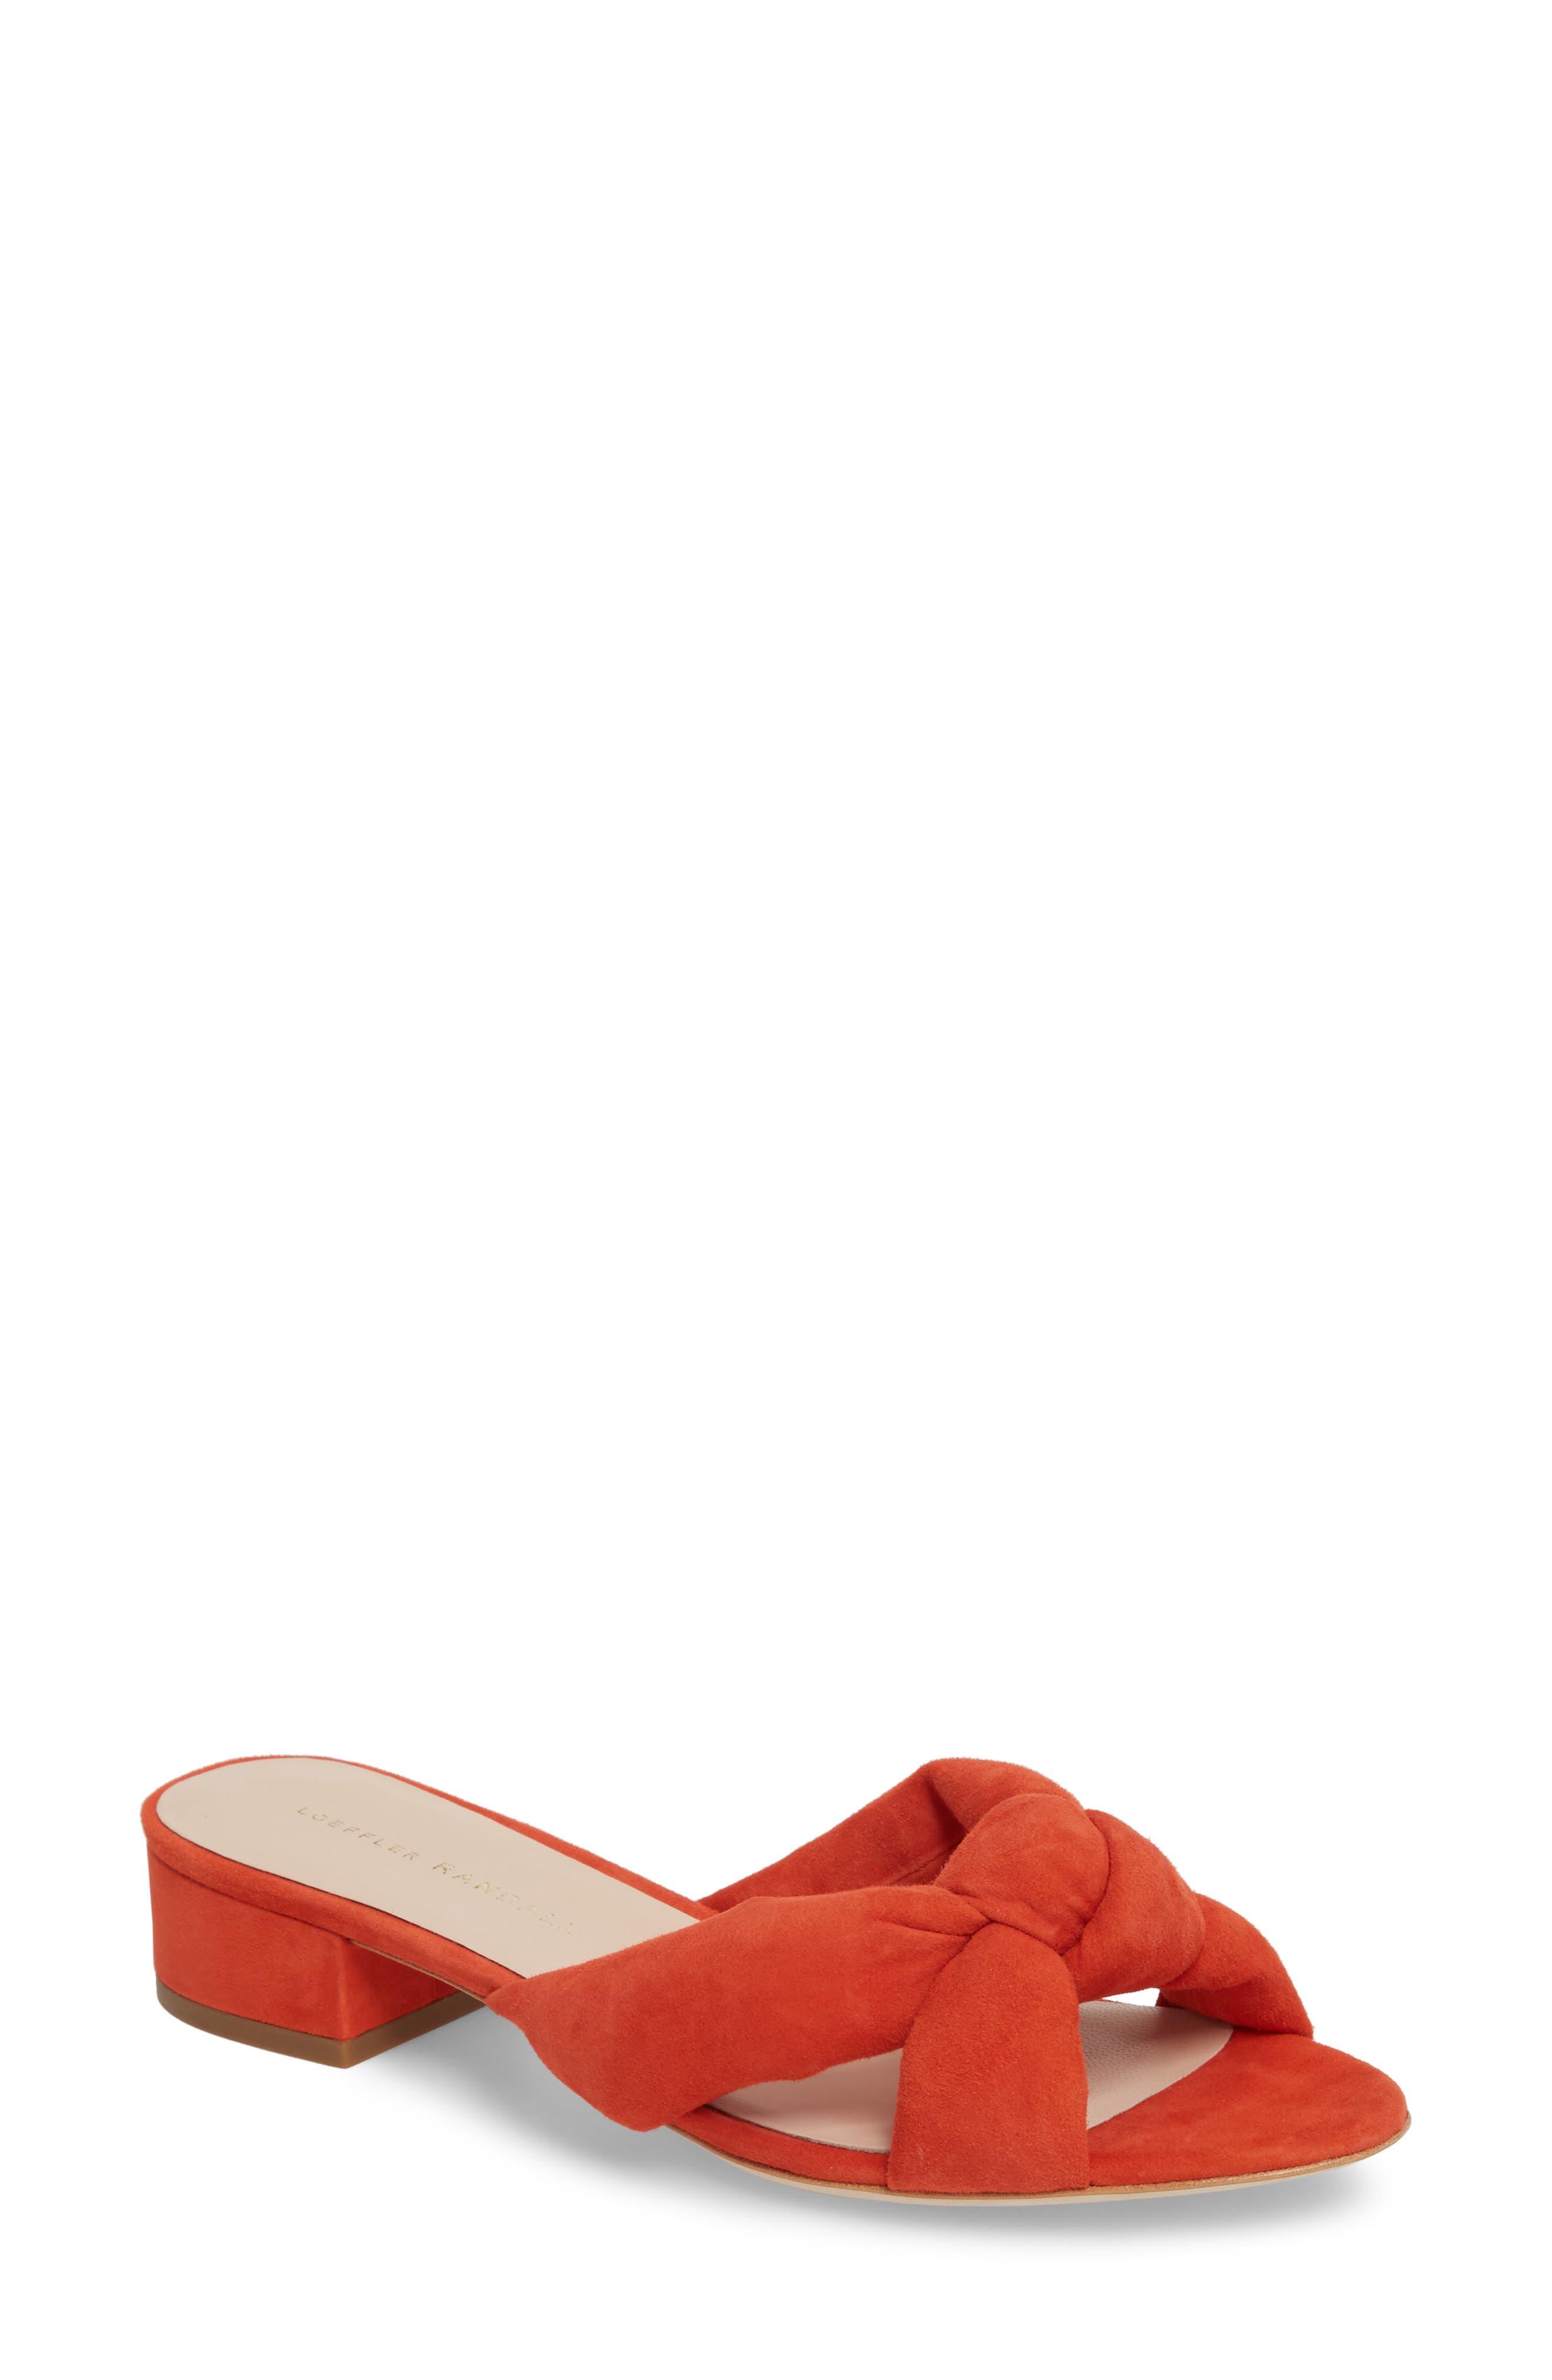 Elsie Knotted Slide Sandal,                         Main,                         color, Persimmon